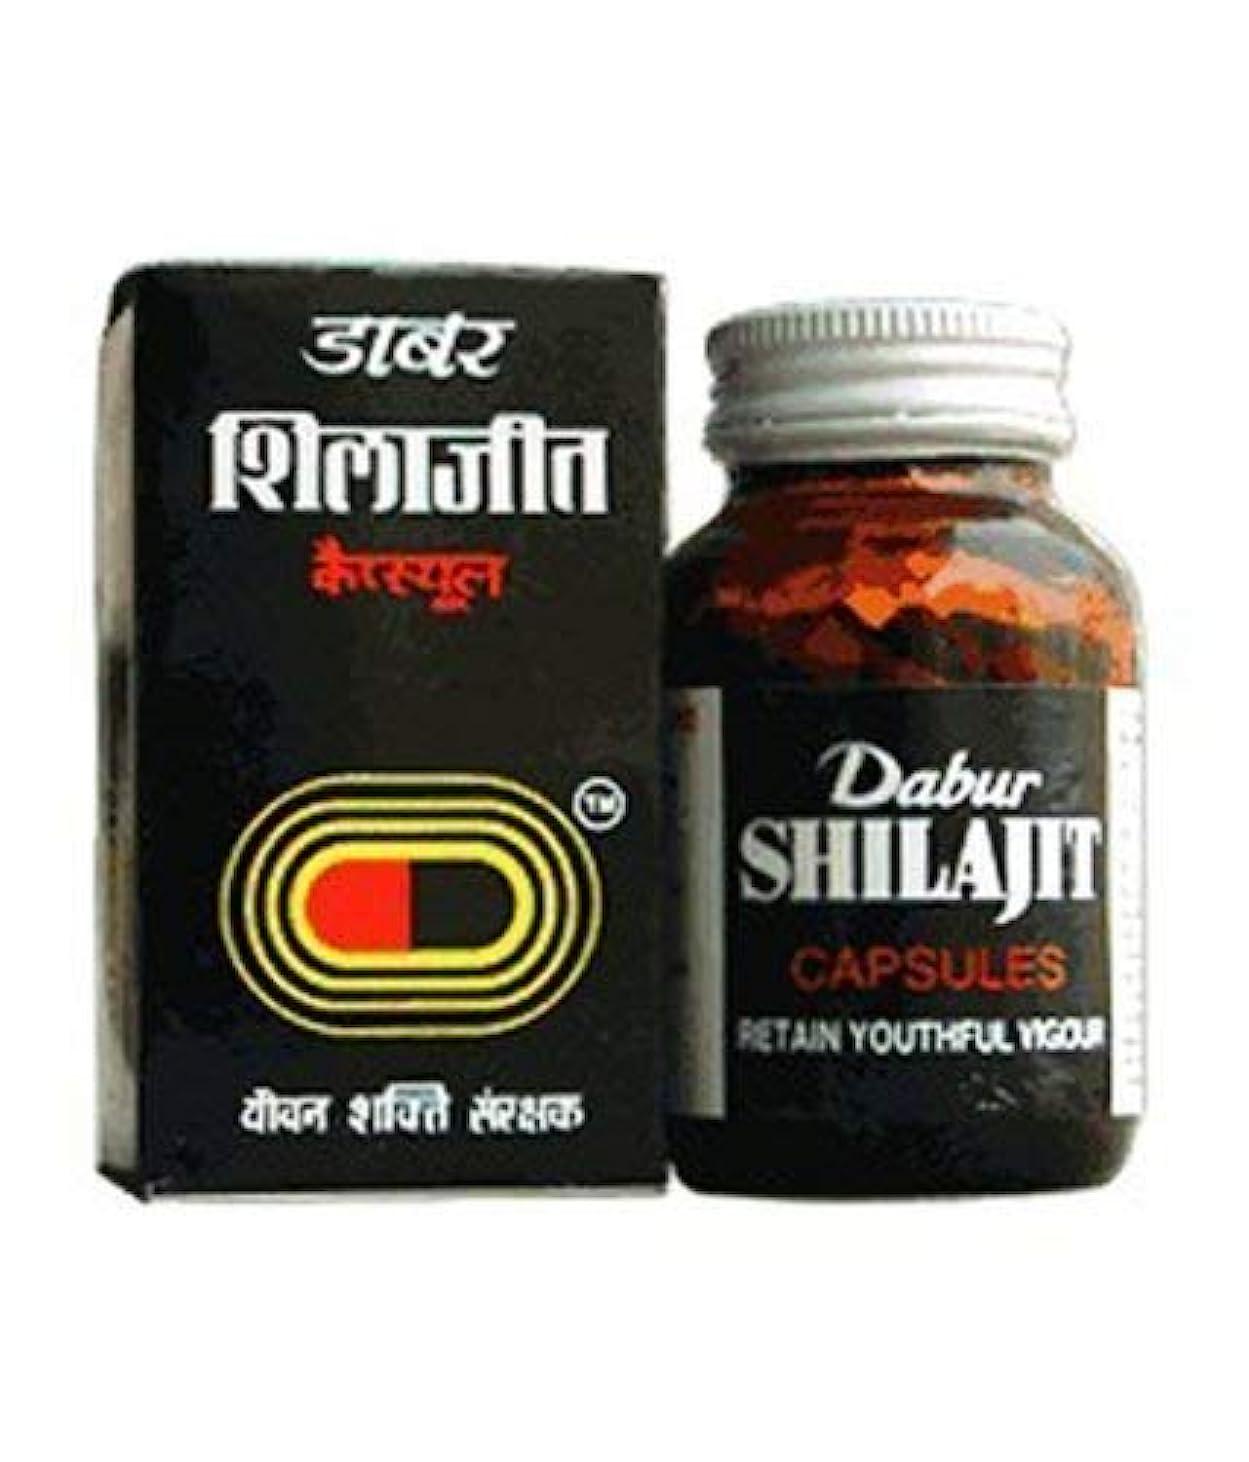 100 Capsules by Dabur Shilajit